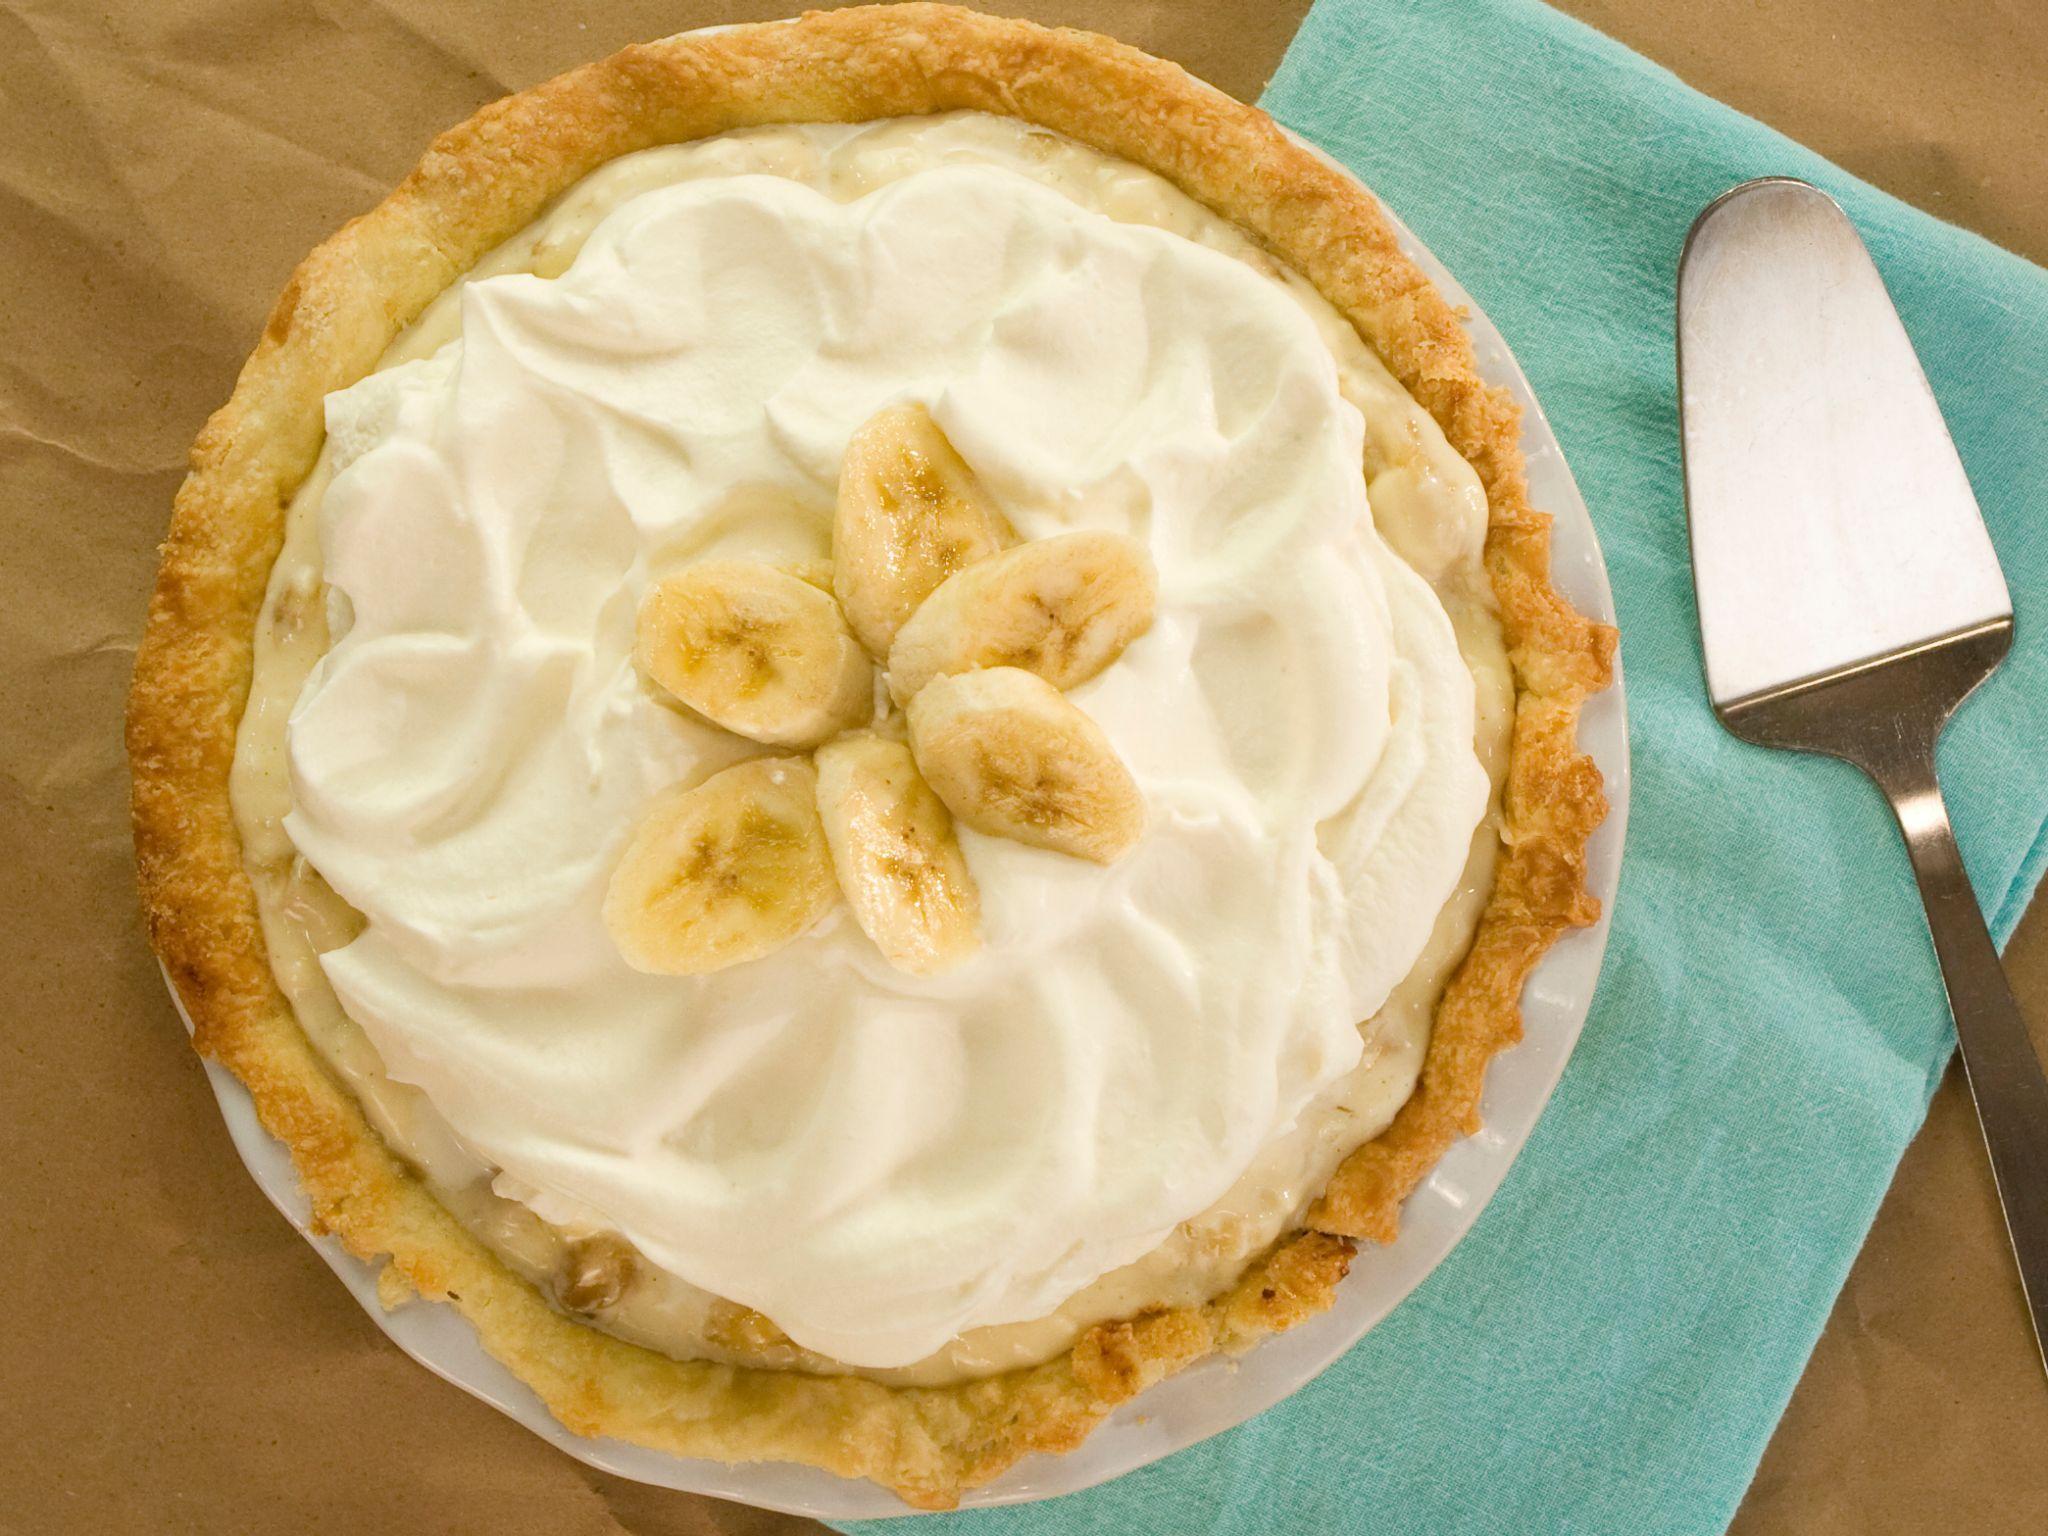 Banana Caramel Cream Pie recipe from Food Network Specials via Food Network